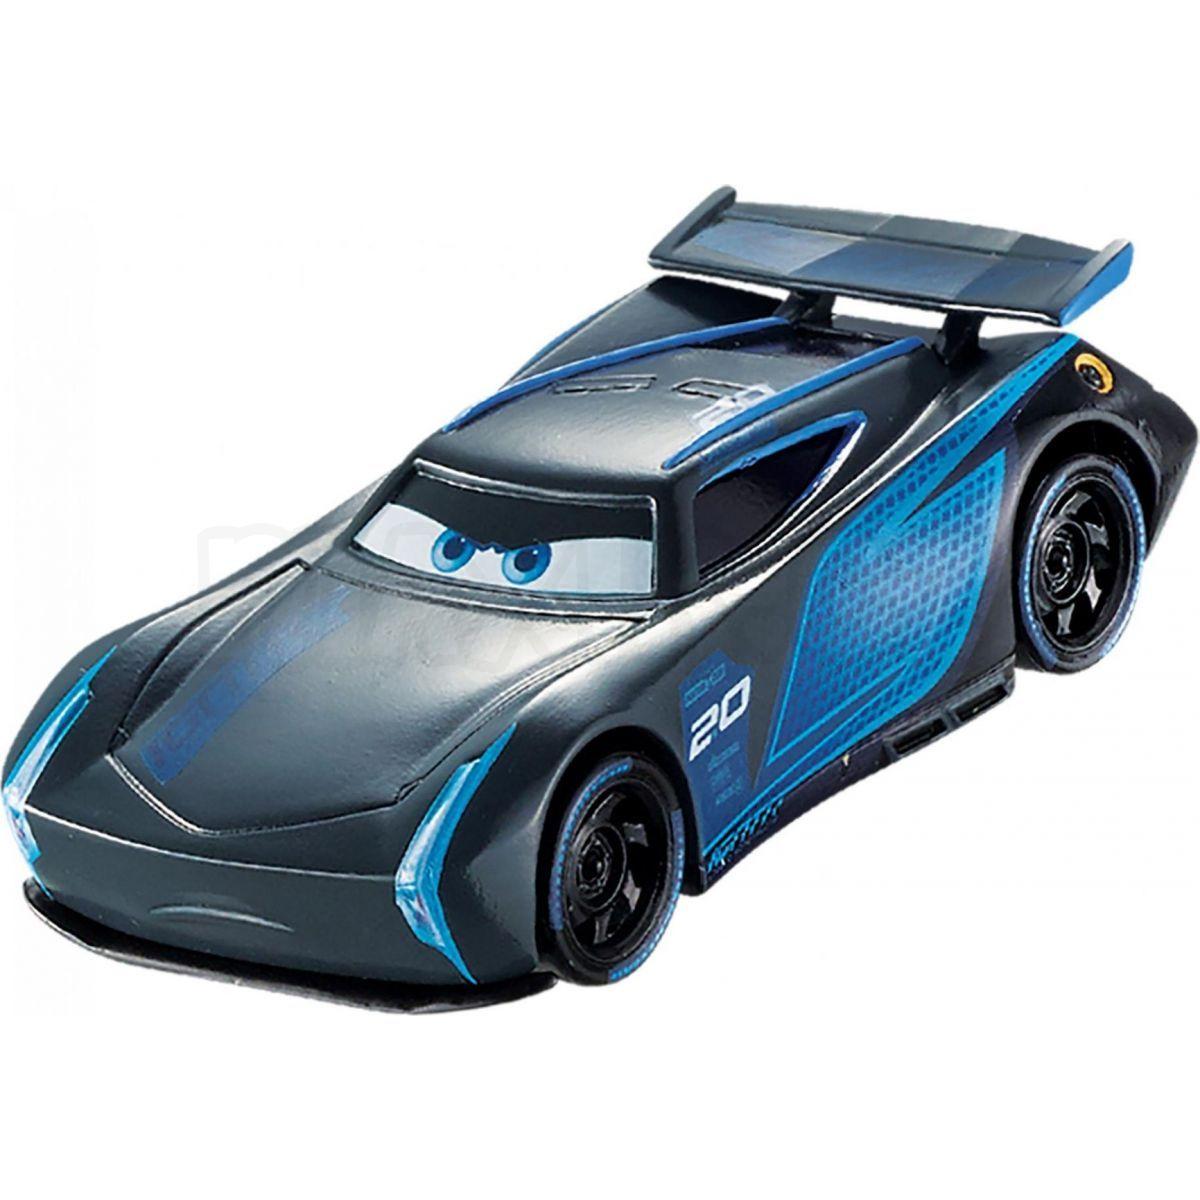 mattel cars 3 auta jackson storm max kovy hra ky. Black Bedroom Furniture Sets. Home Design Ideas